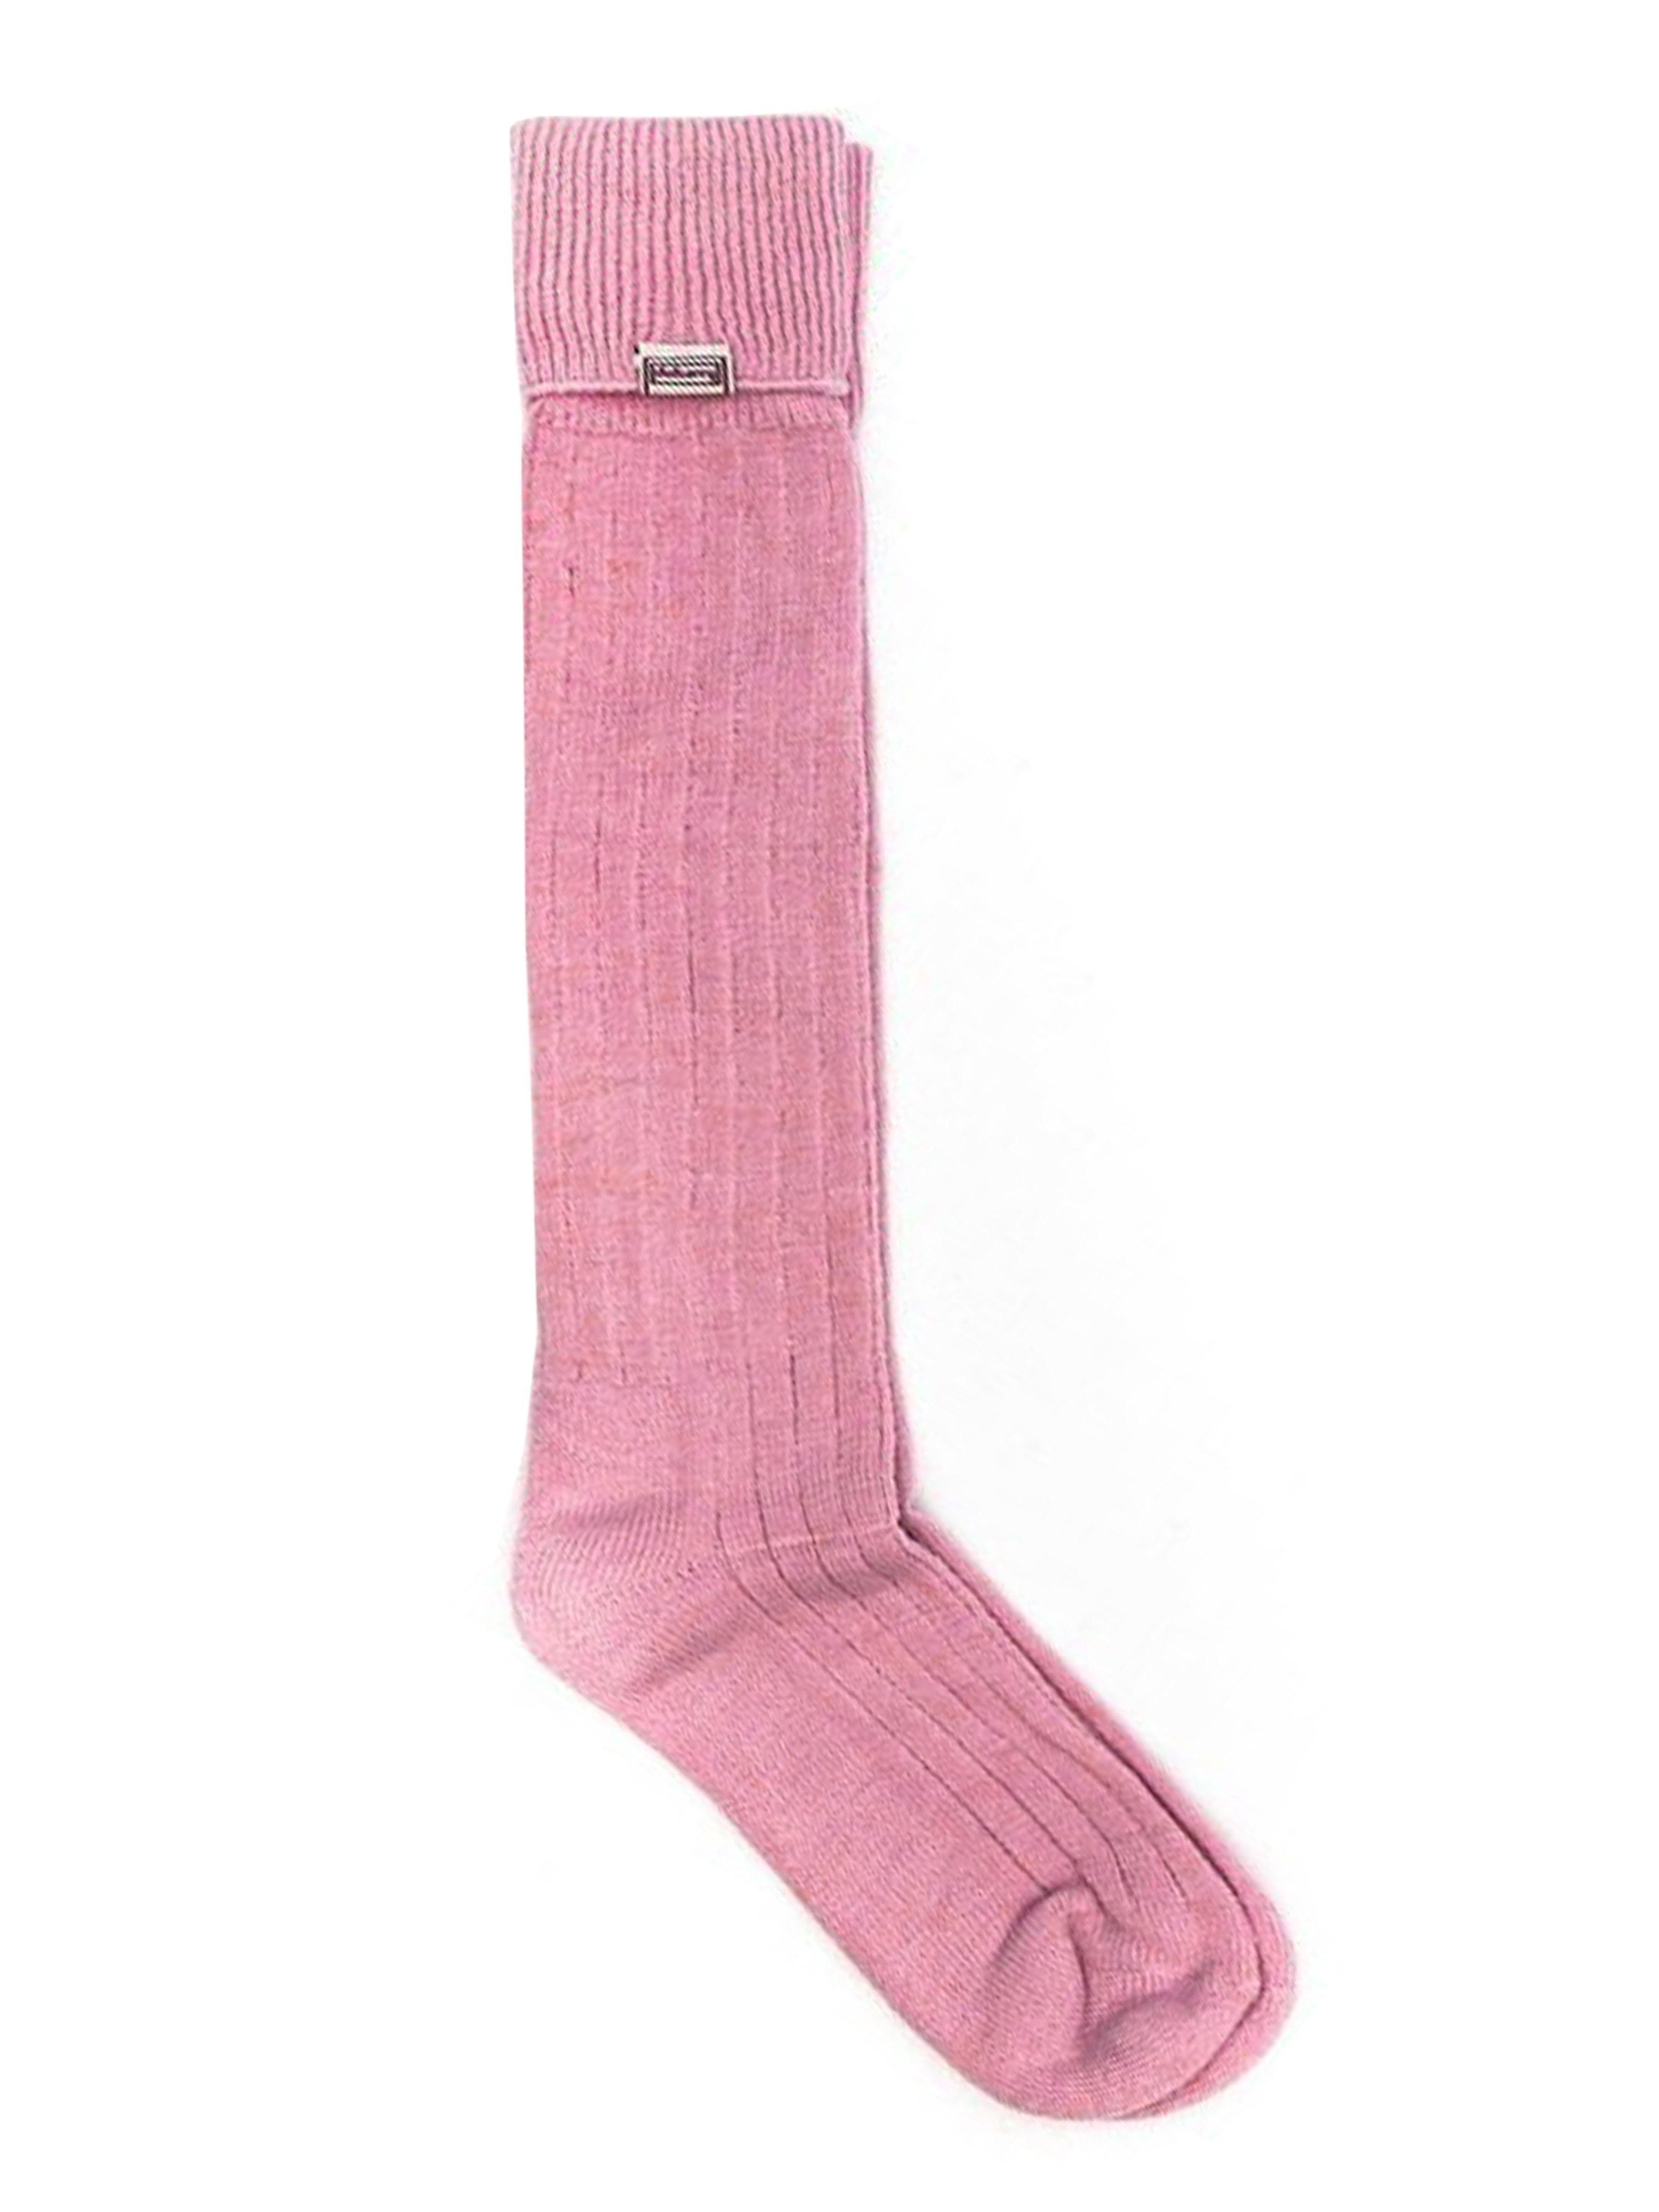 Dubarry Women's Alpaca Socks - Baby Pink